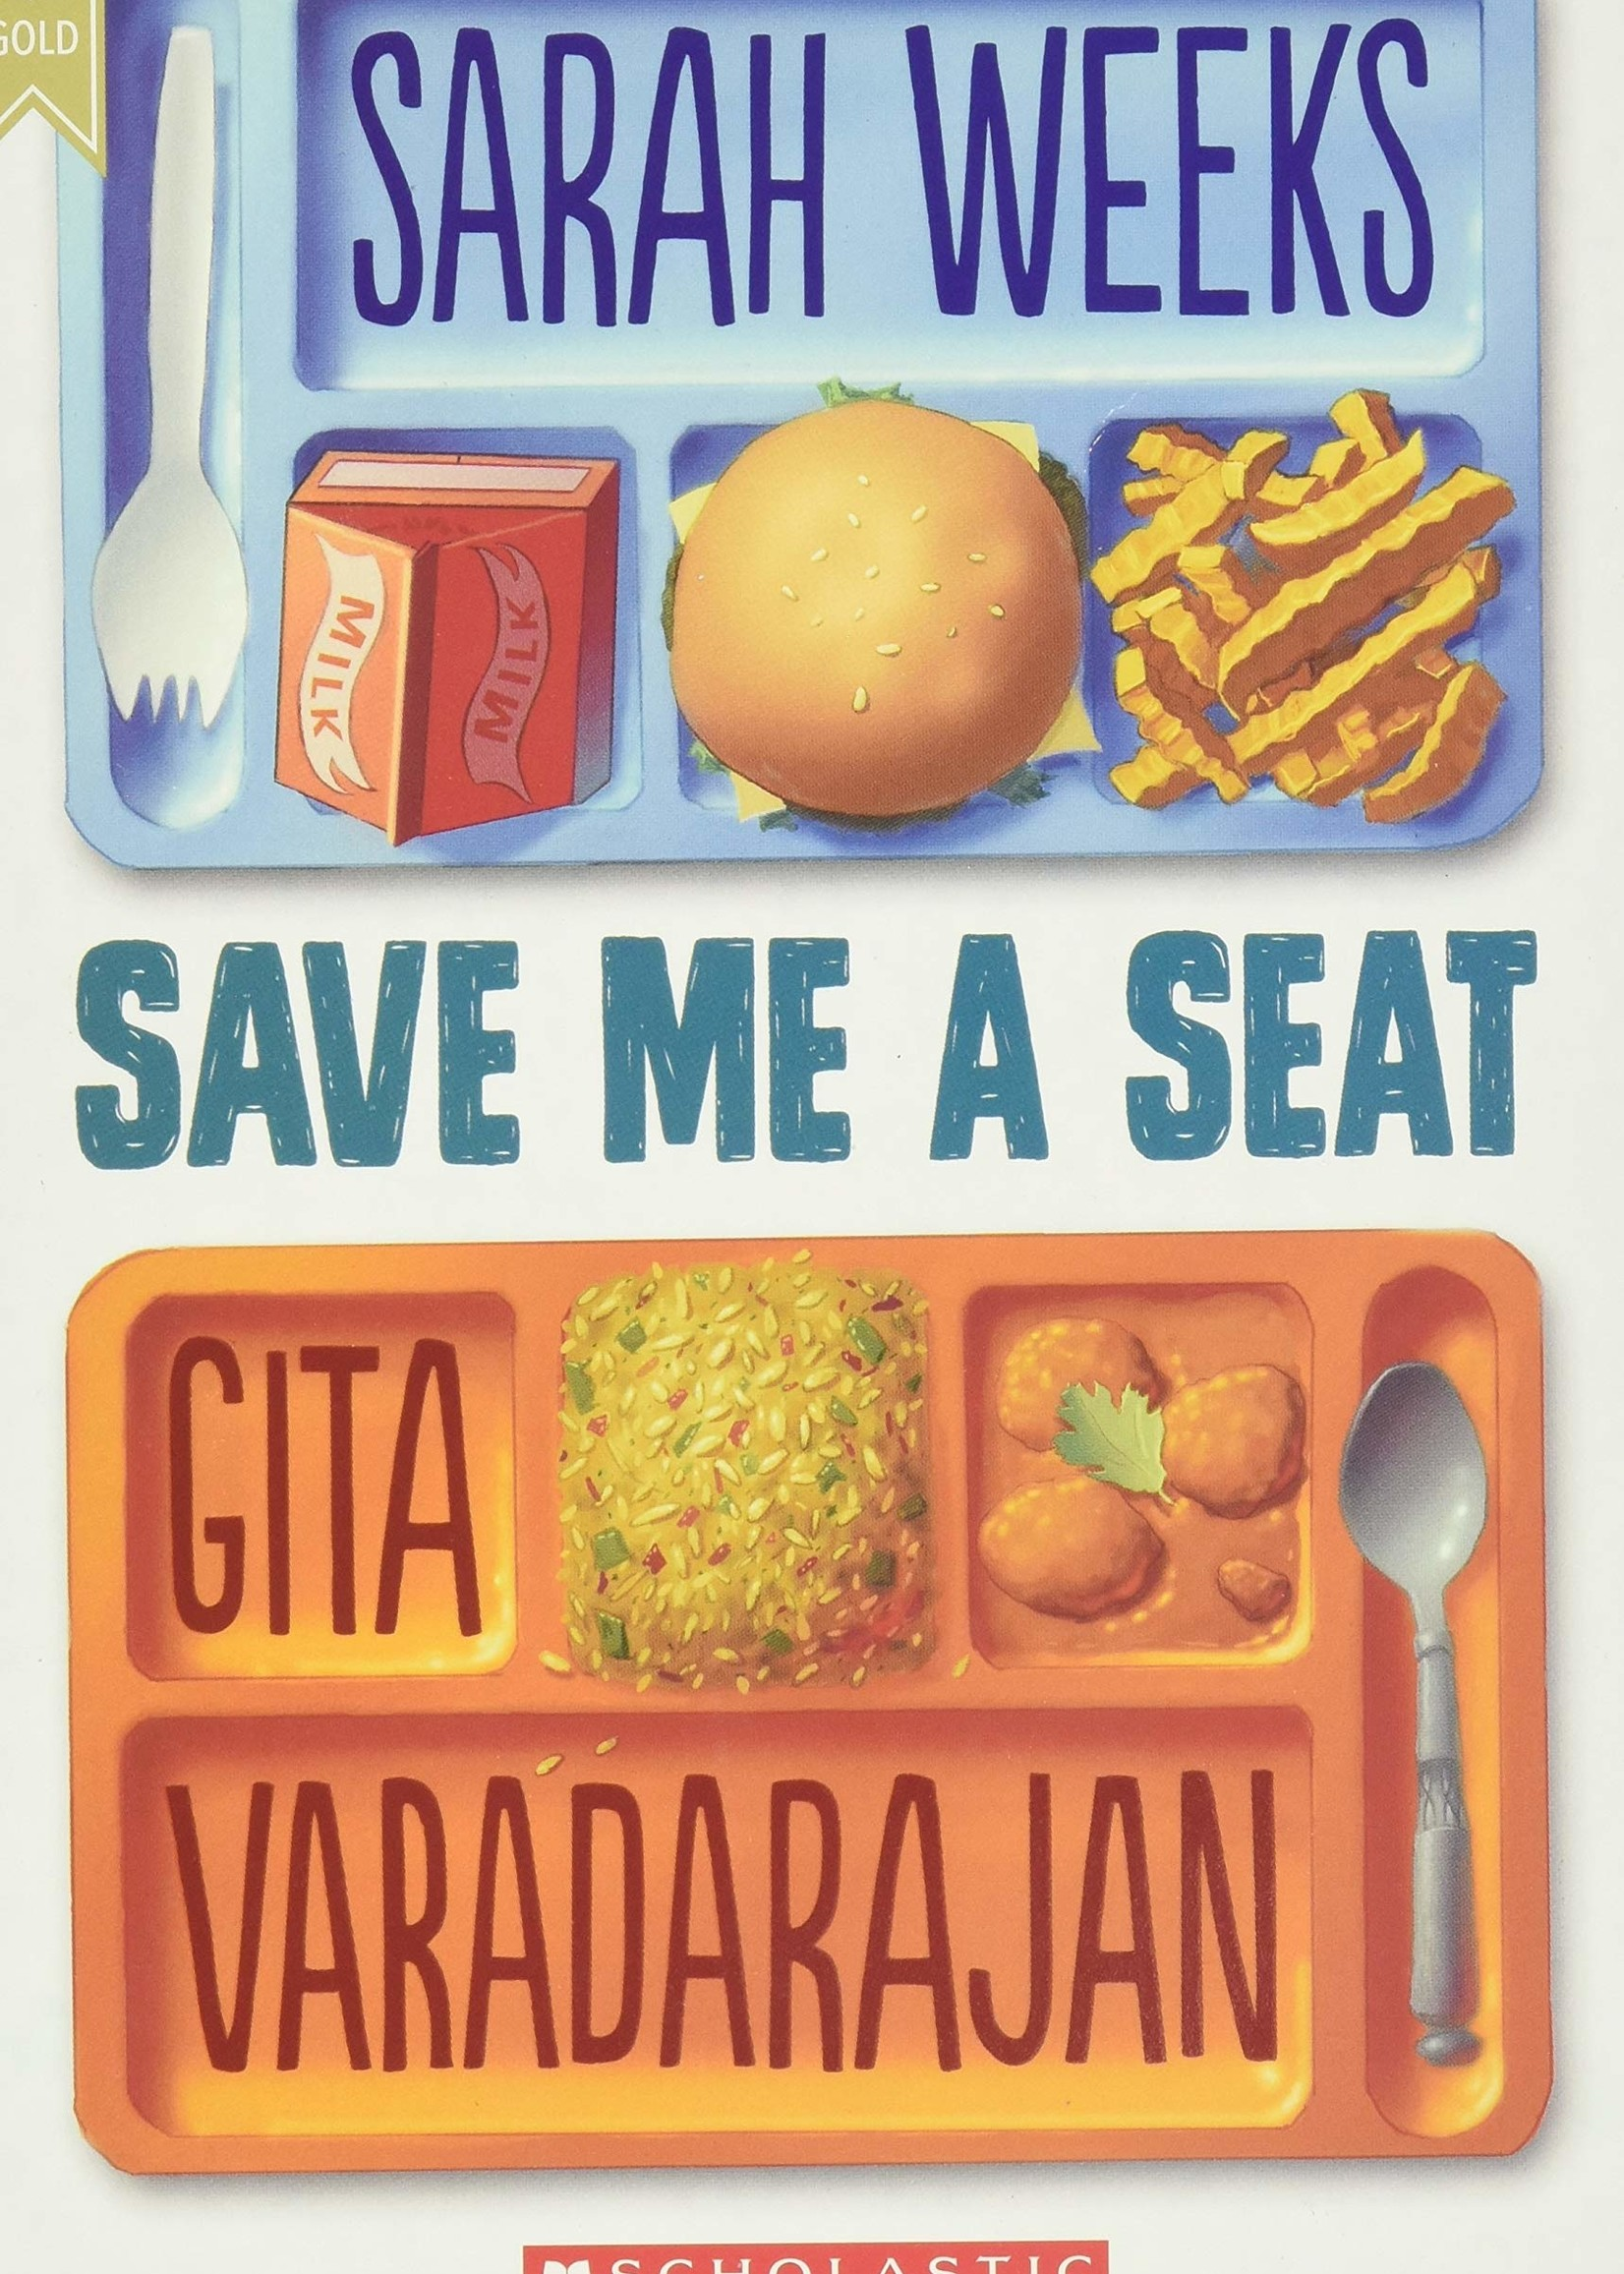 OBOB 21/22: Save Me a Seat - Paperback